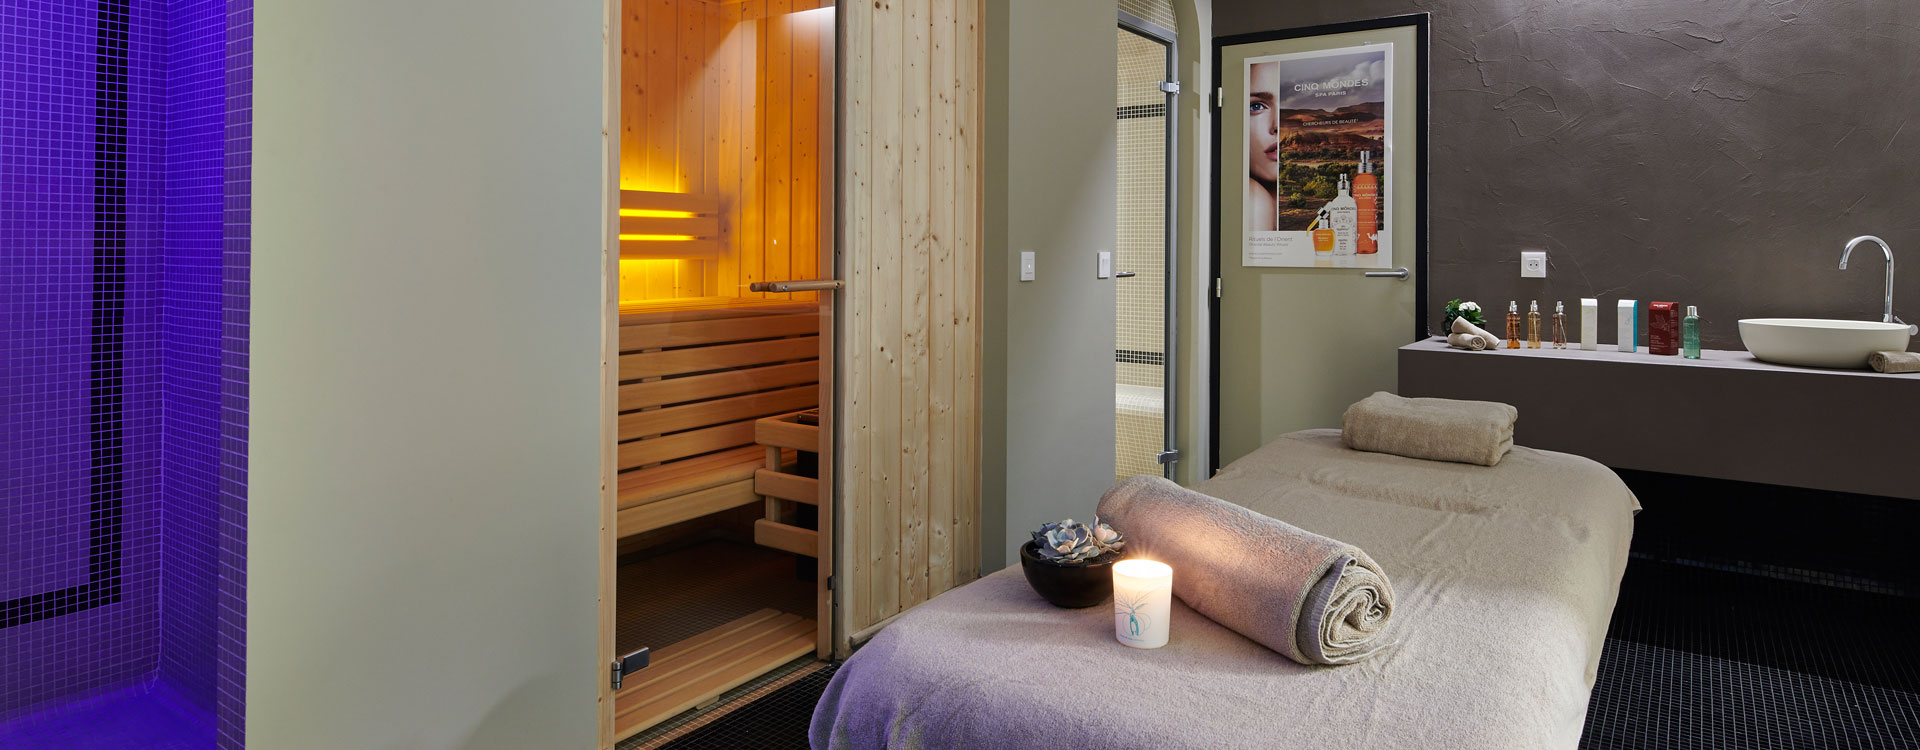 cabine de soins - spa splendid dax